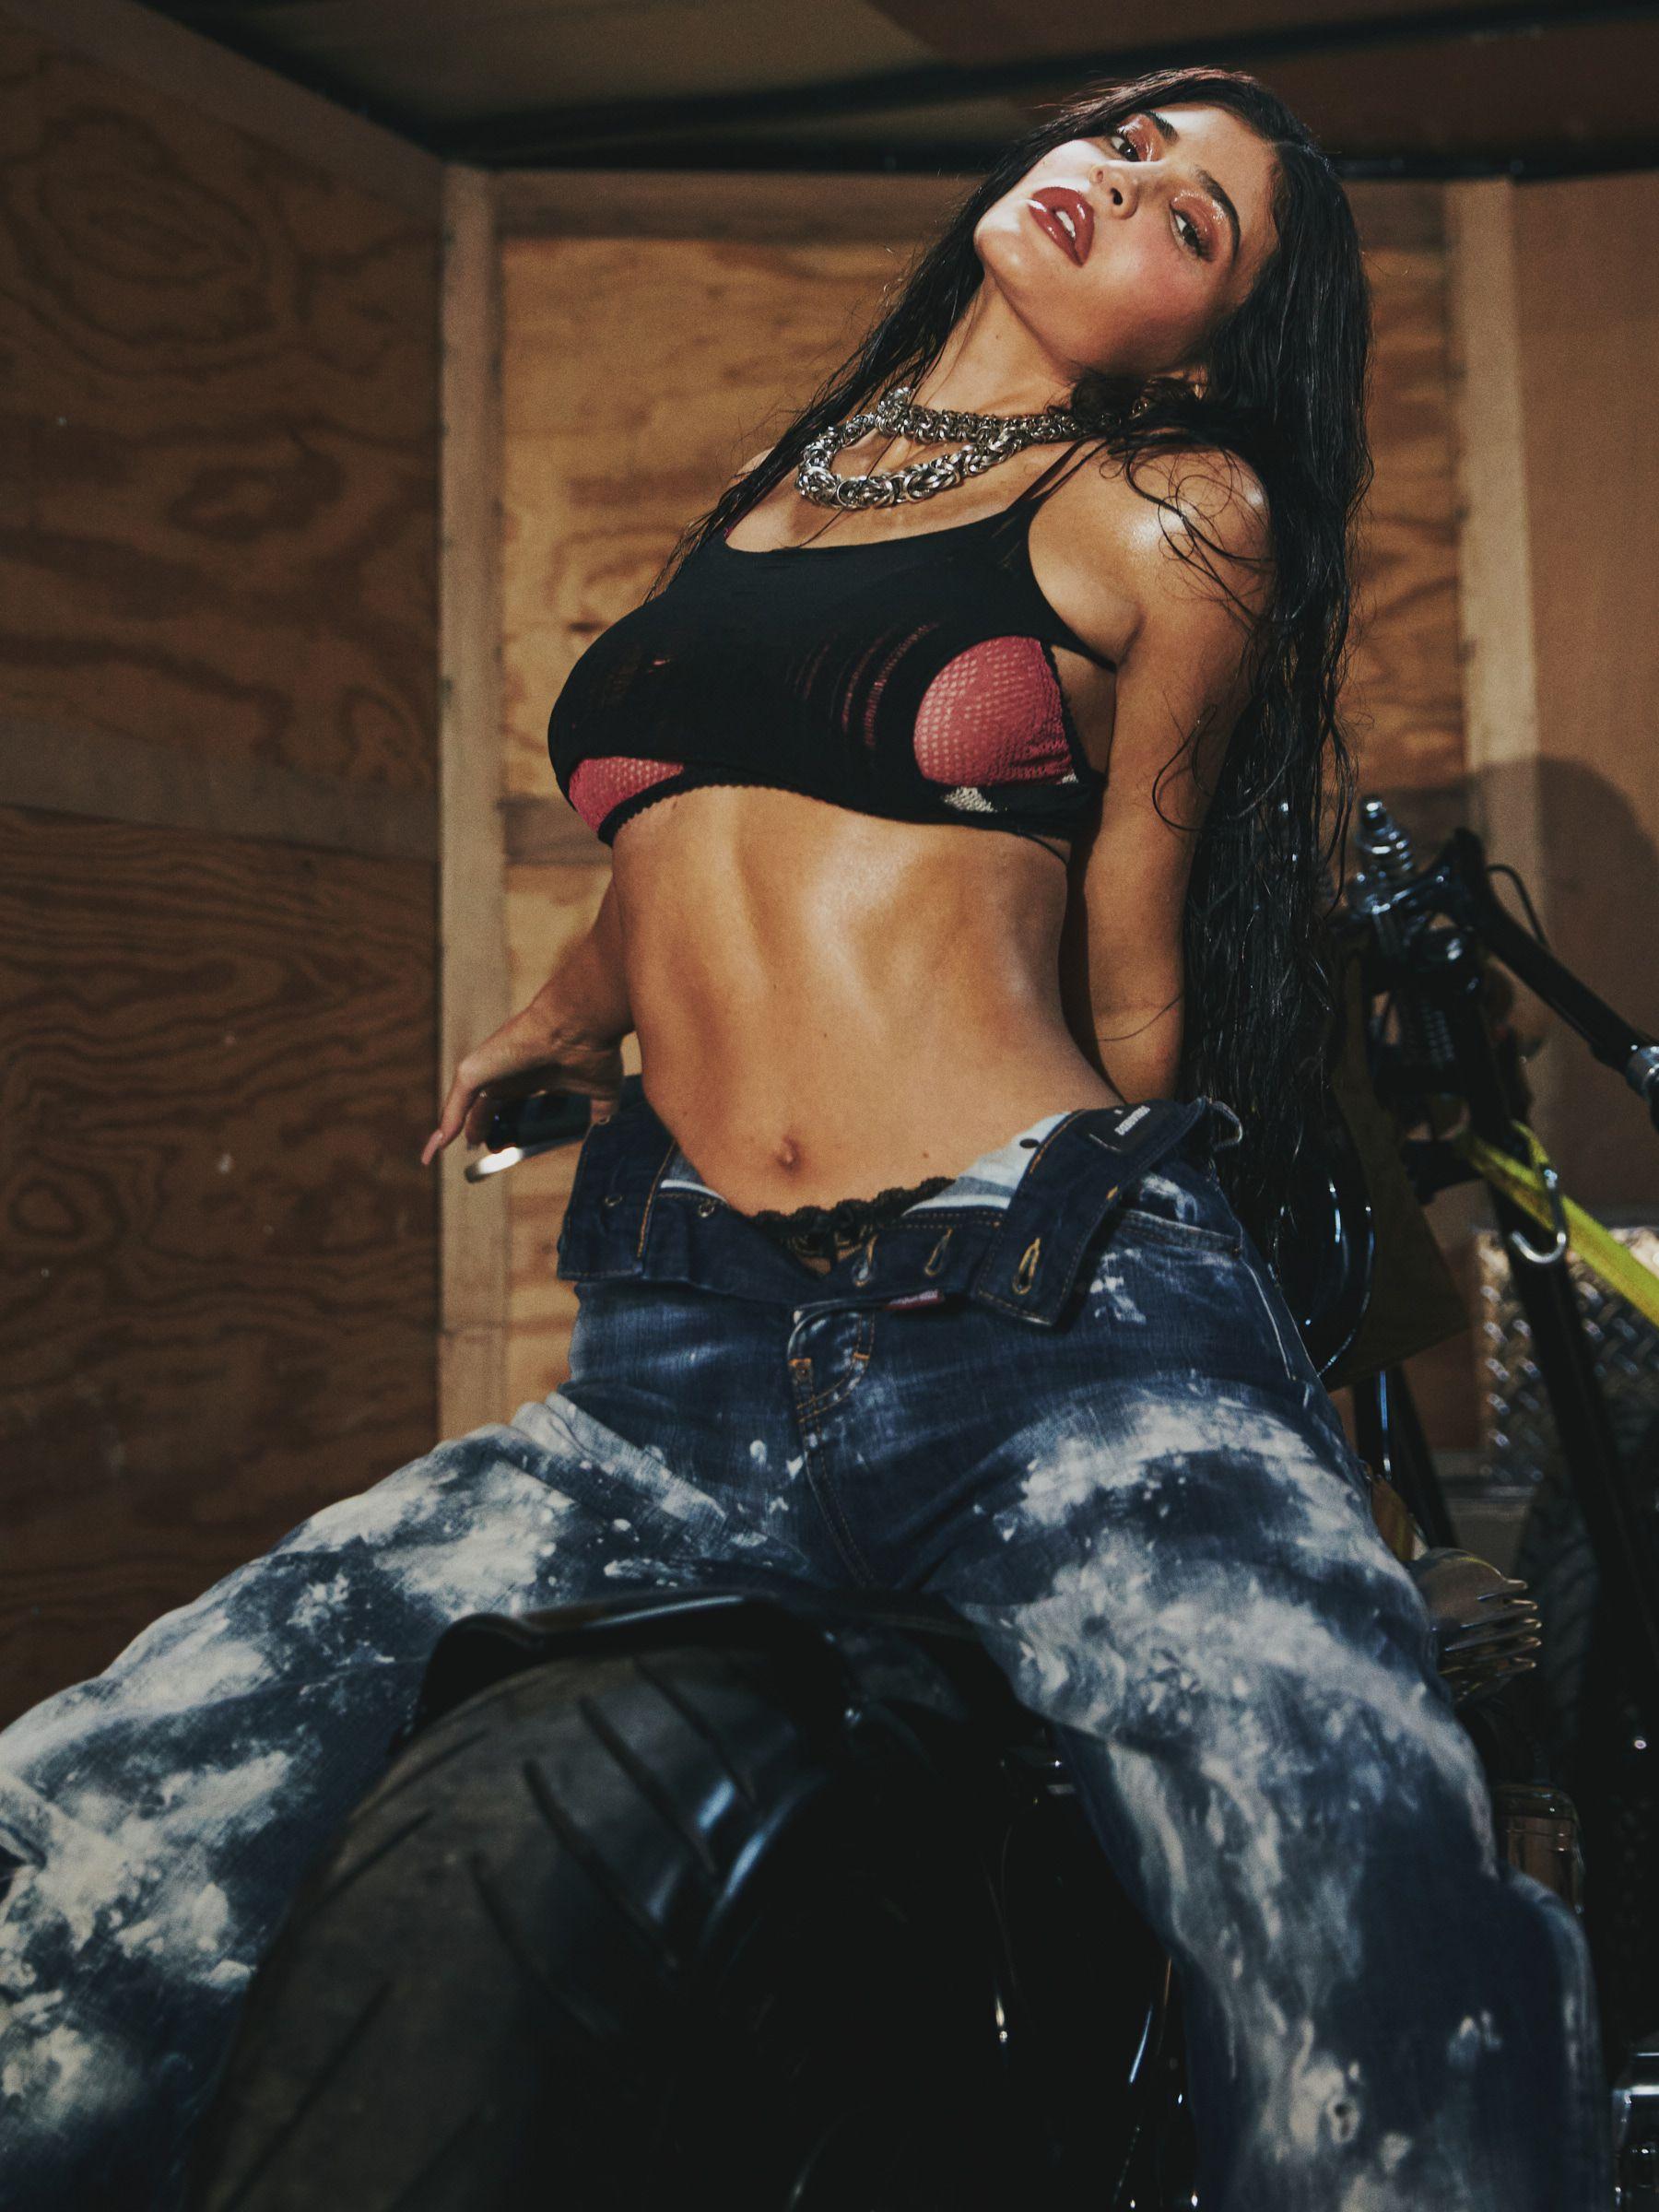 Kylie Jenner Sexy Photoshoot